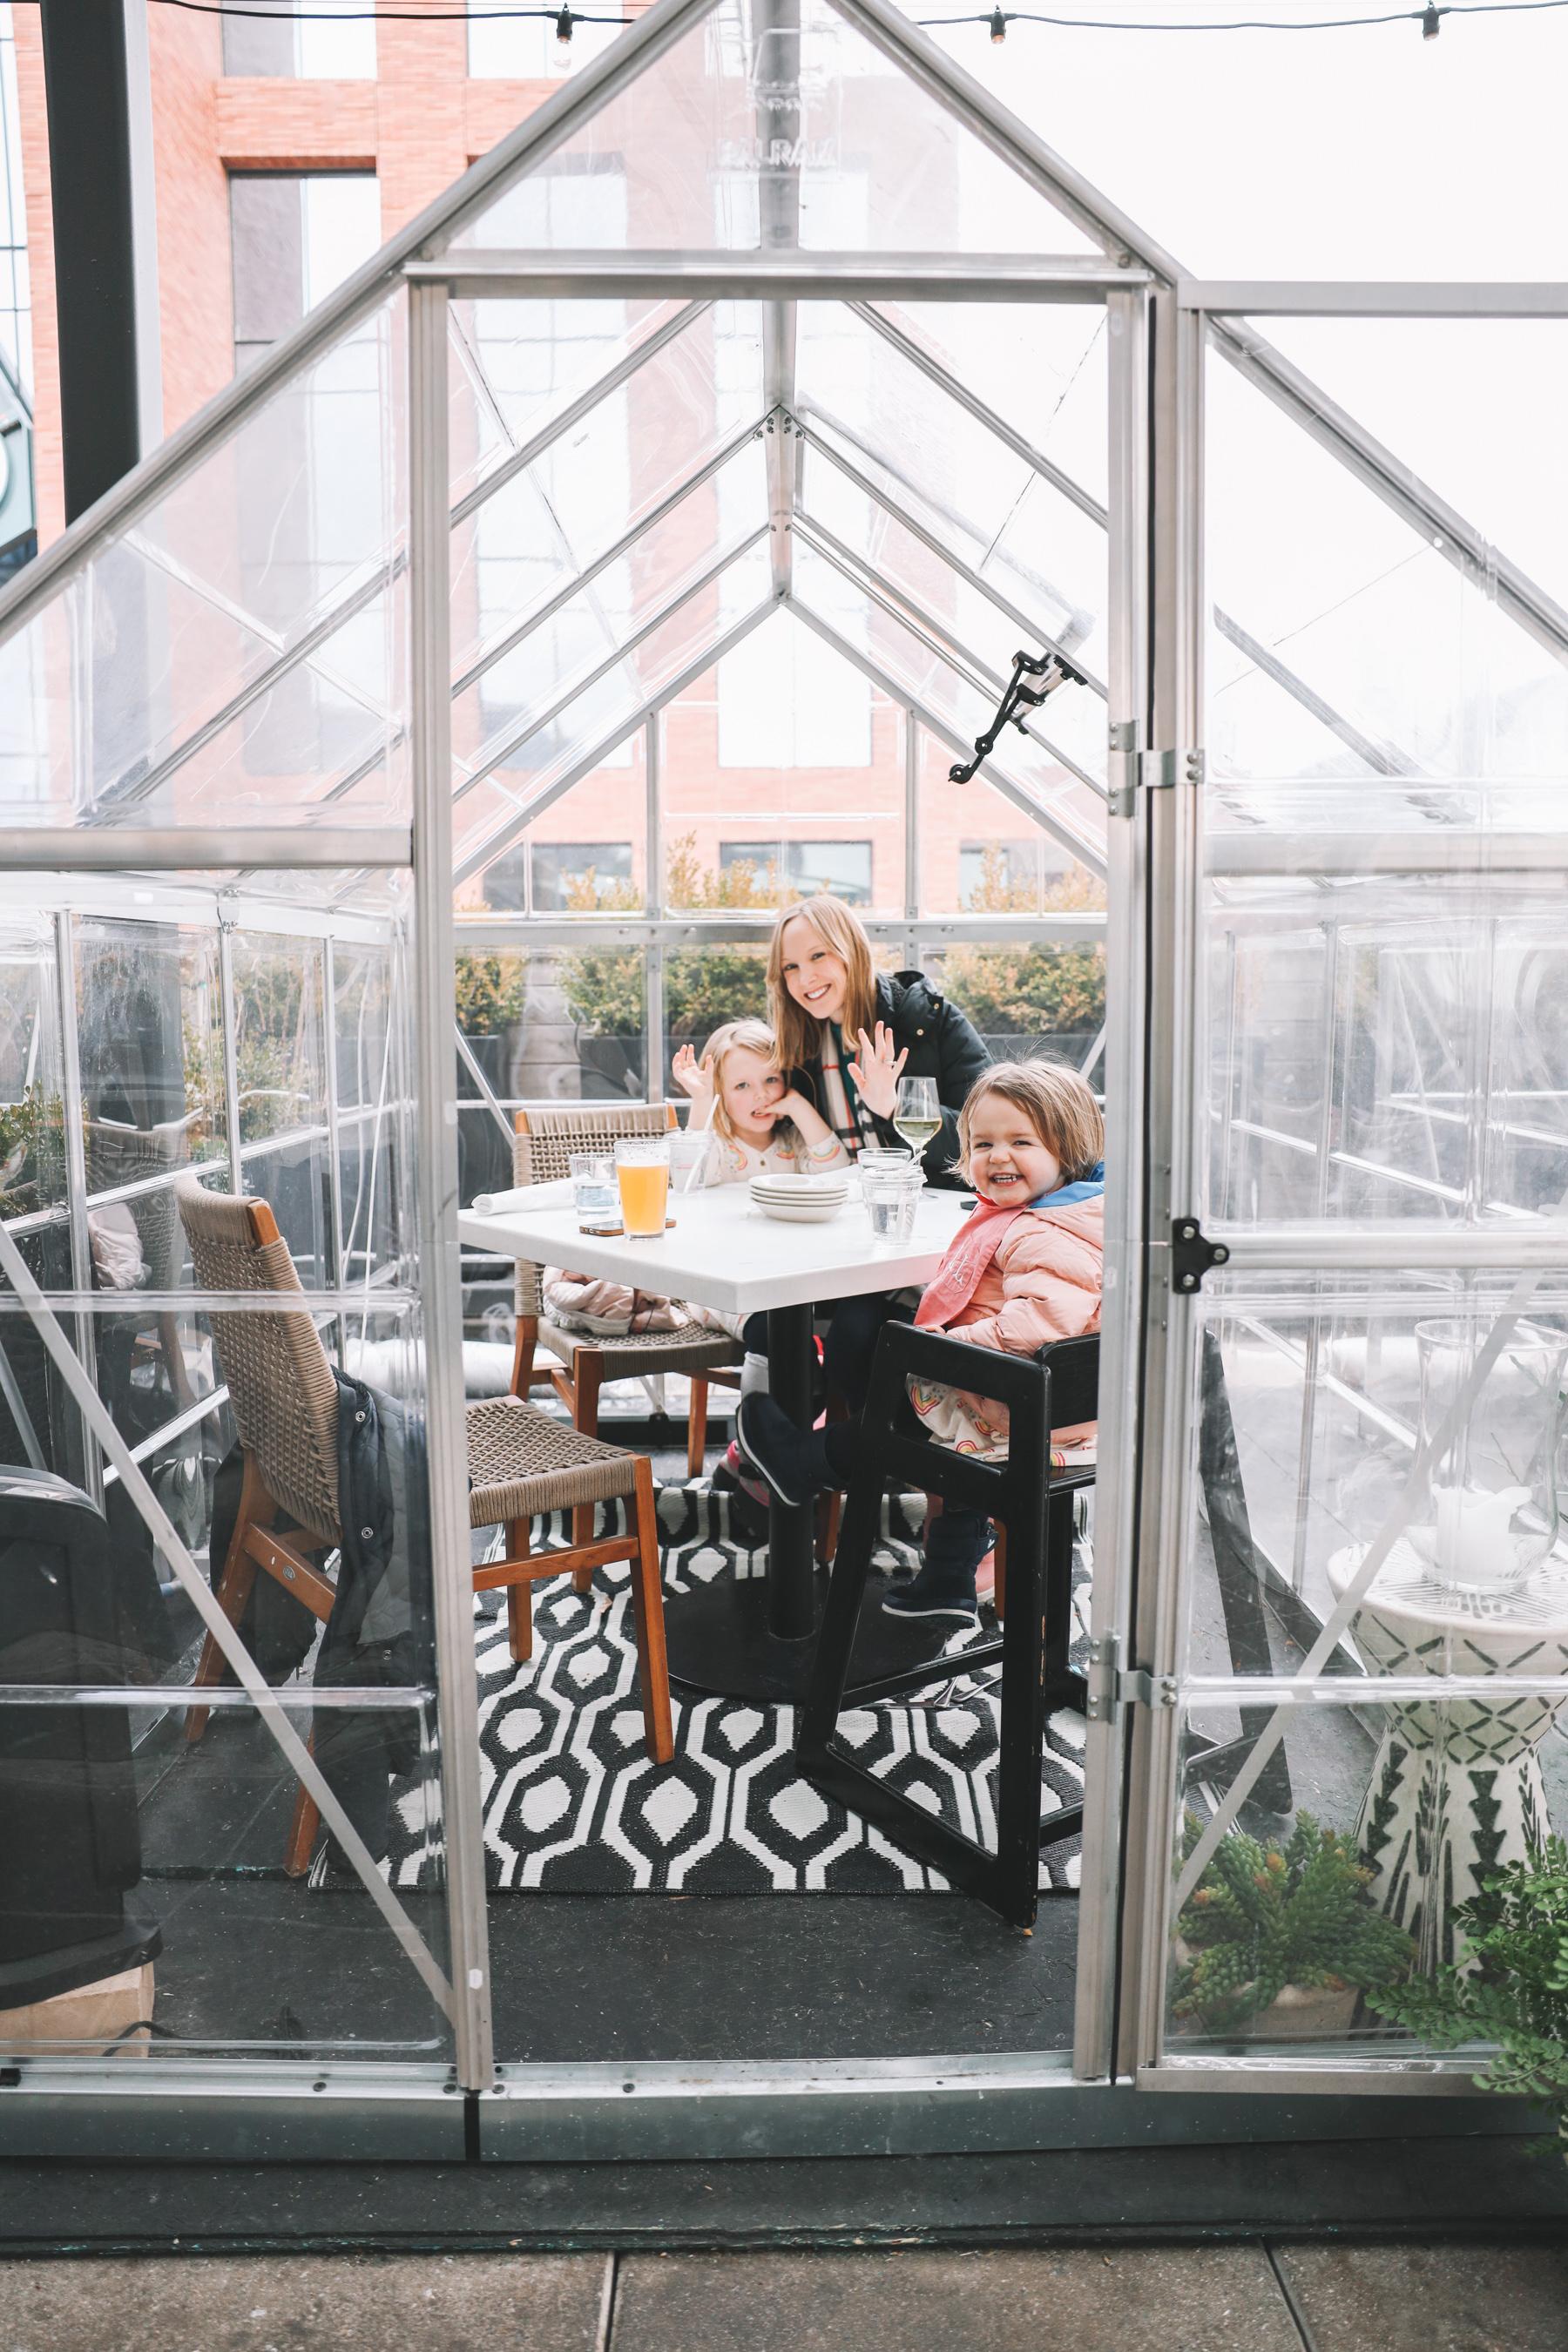 greenhouse igloo restaurants